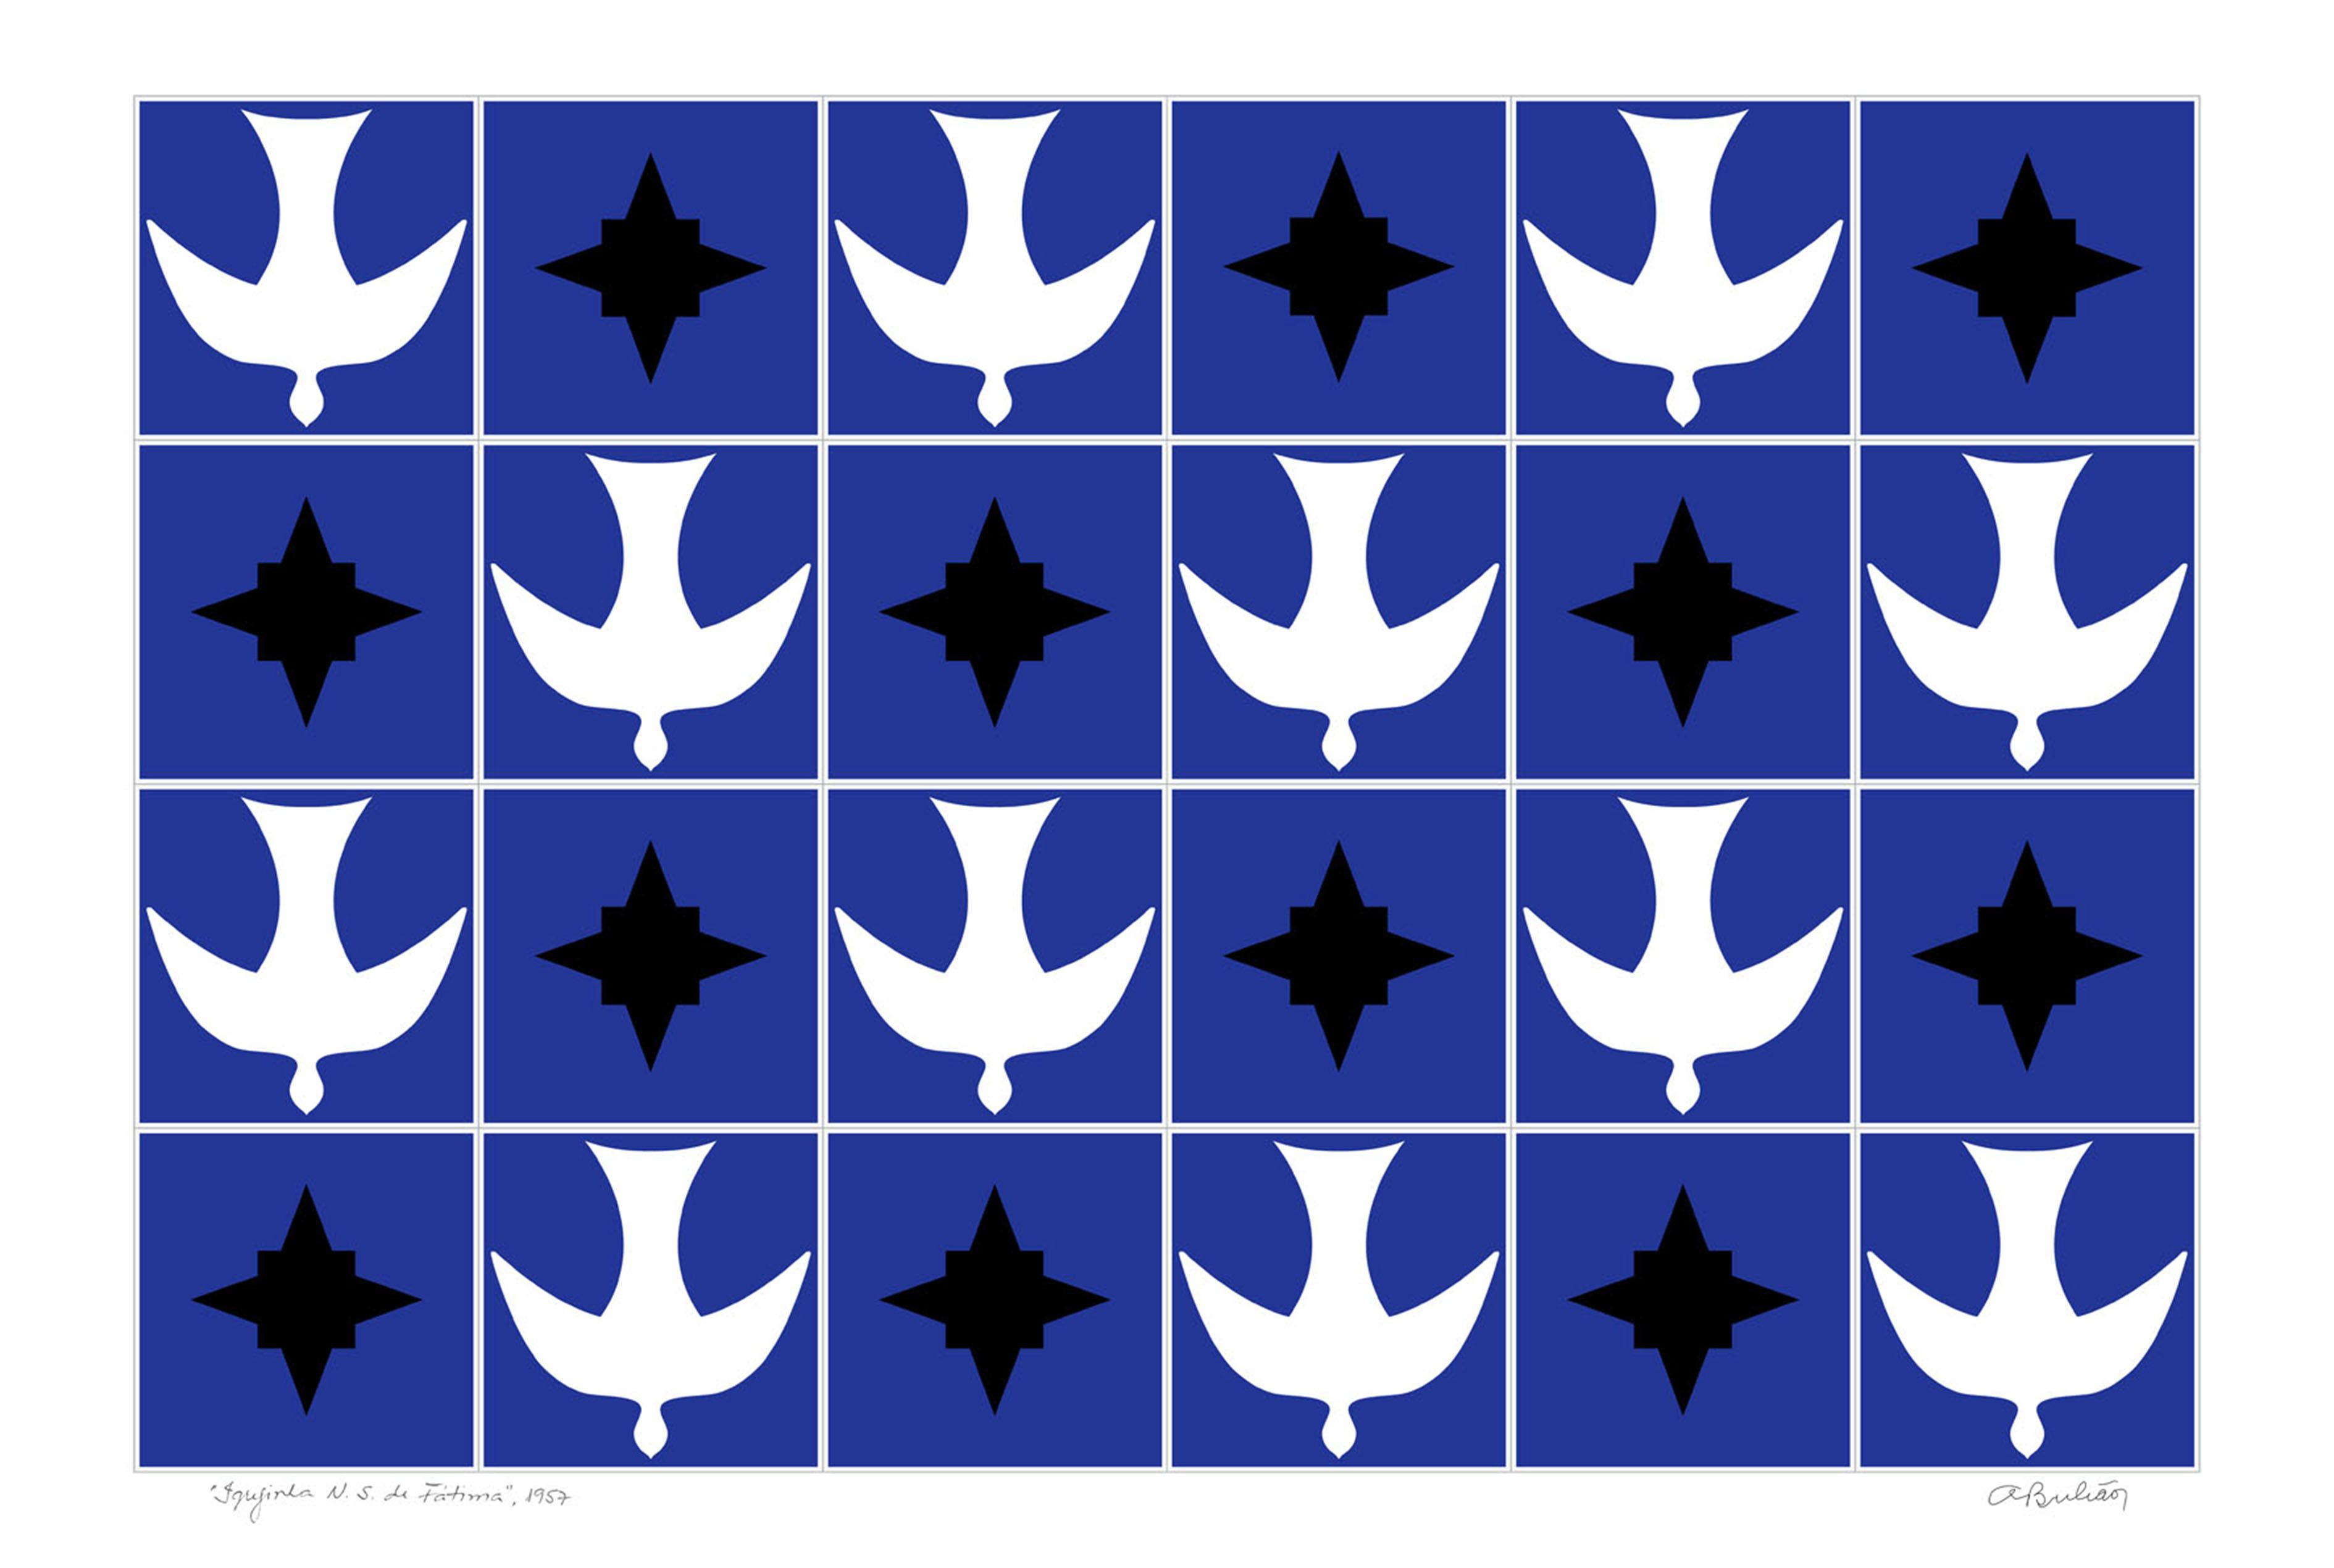 Mosaico-10-OK.jpg (3780×2540) | Background and wallpaper ...